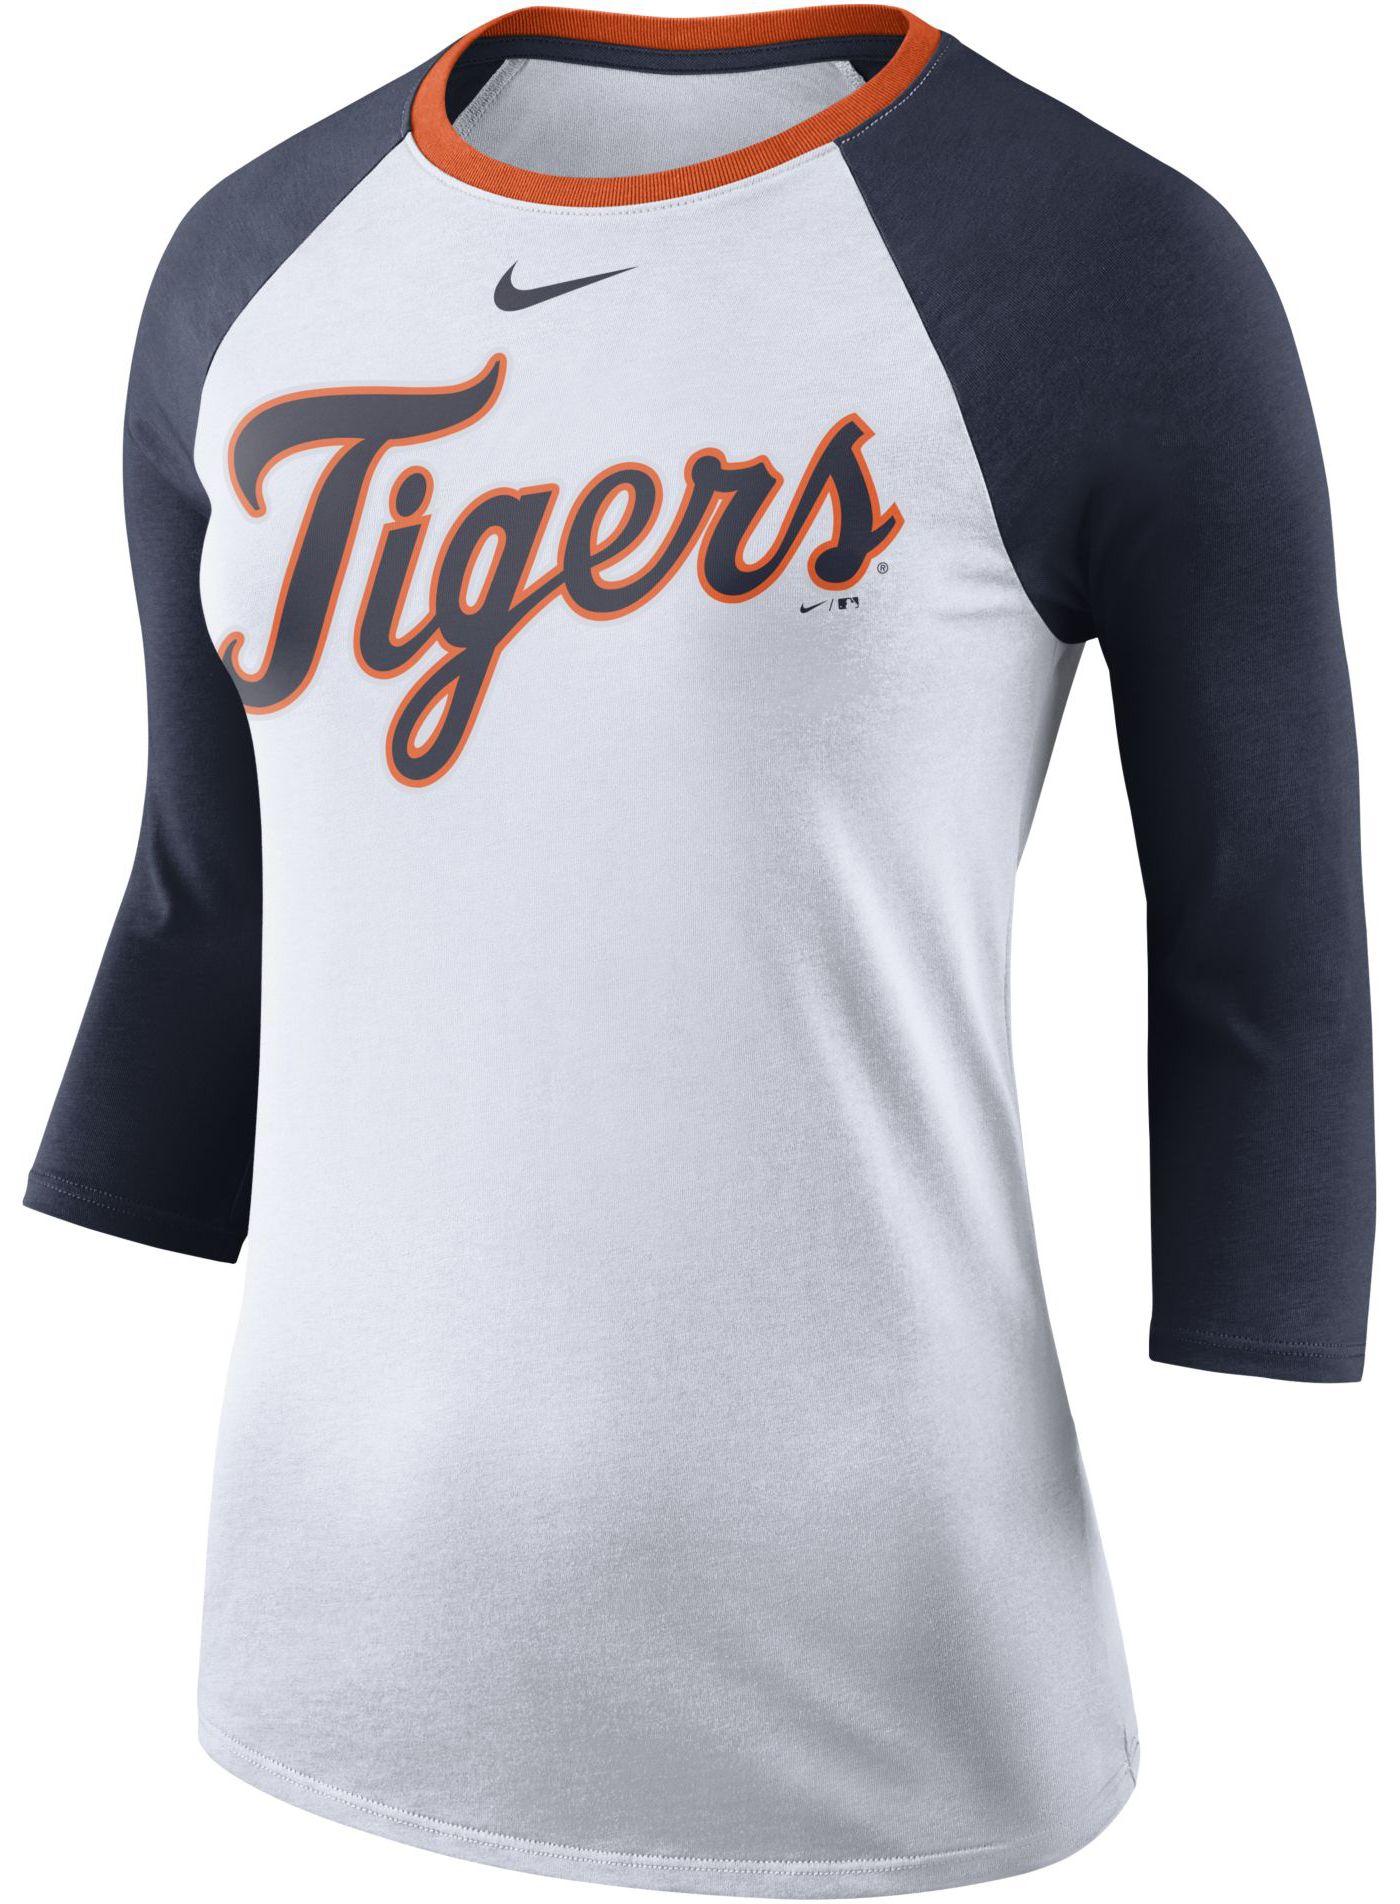 Nike Women's Detroit Tigers Raglan Tri-Blend Three-Quarter Sleeve Shirt